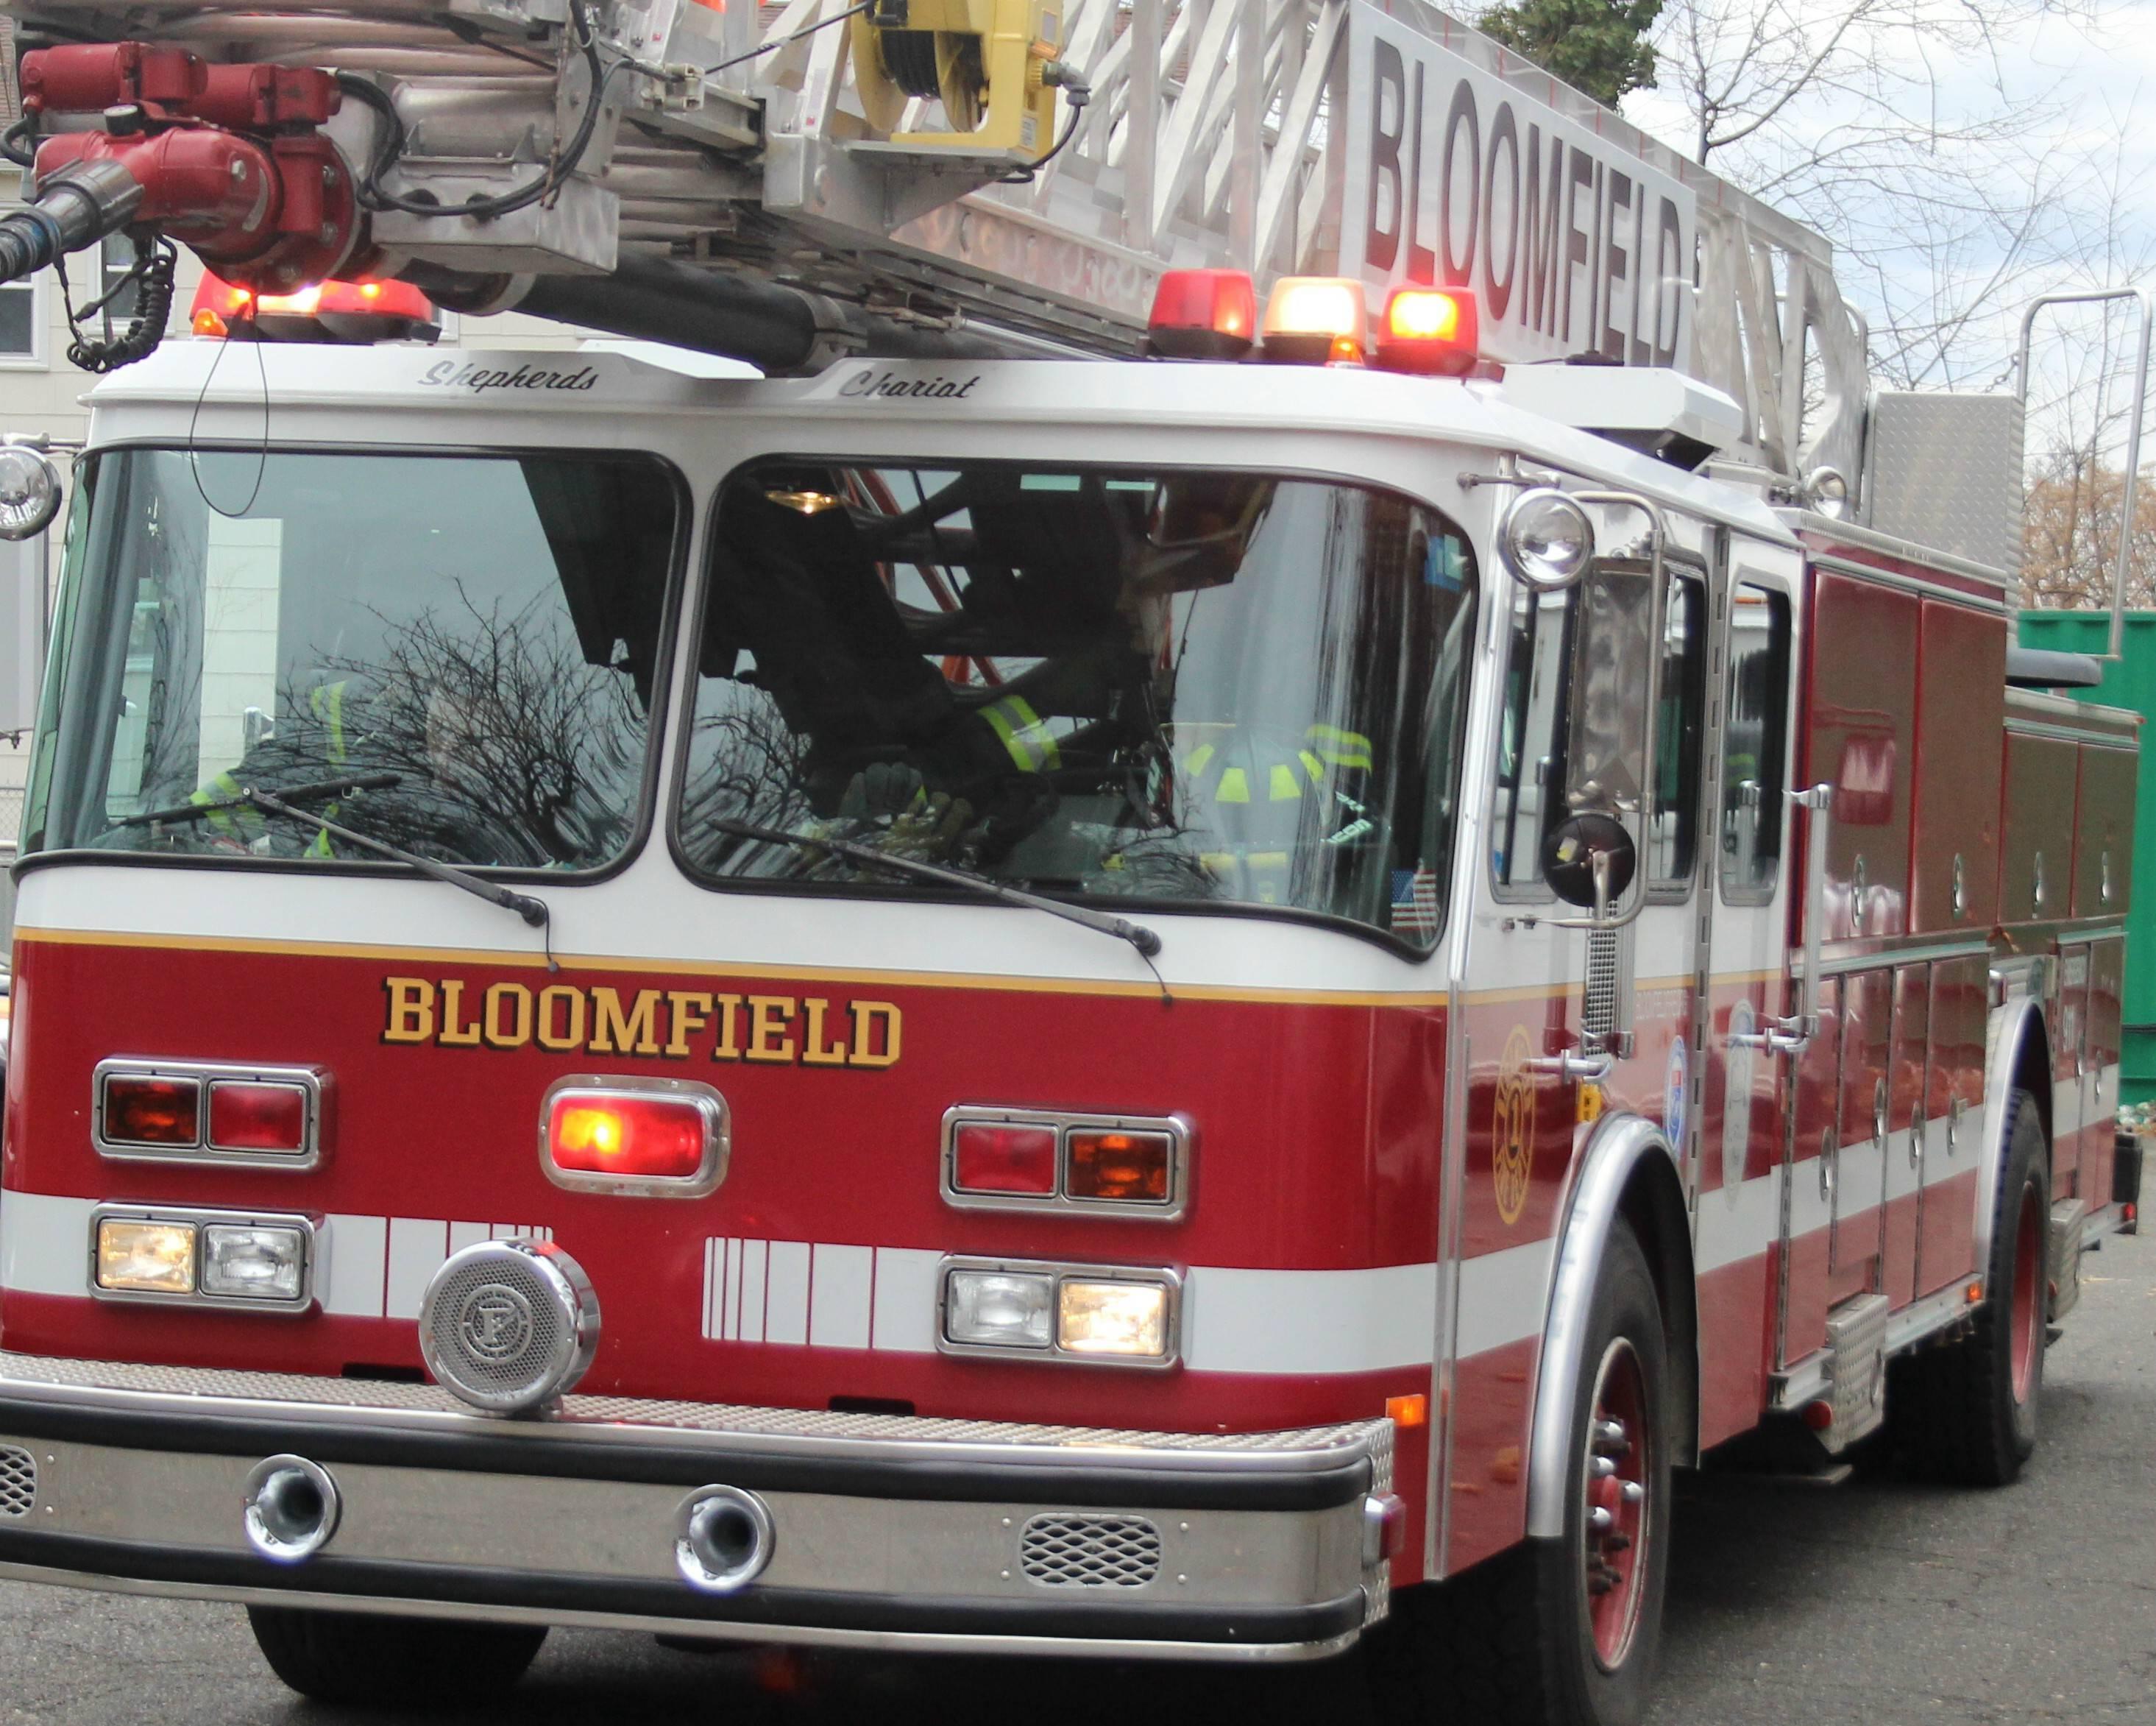 Bloomfield Fire Department 026.jpg